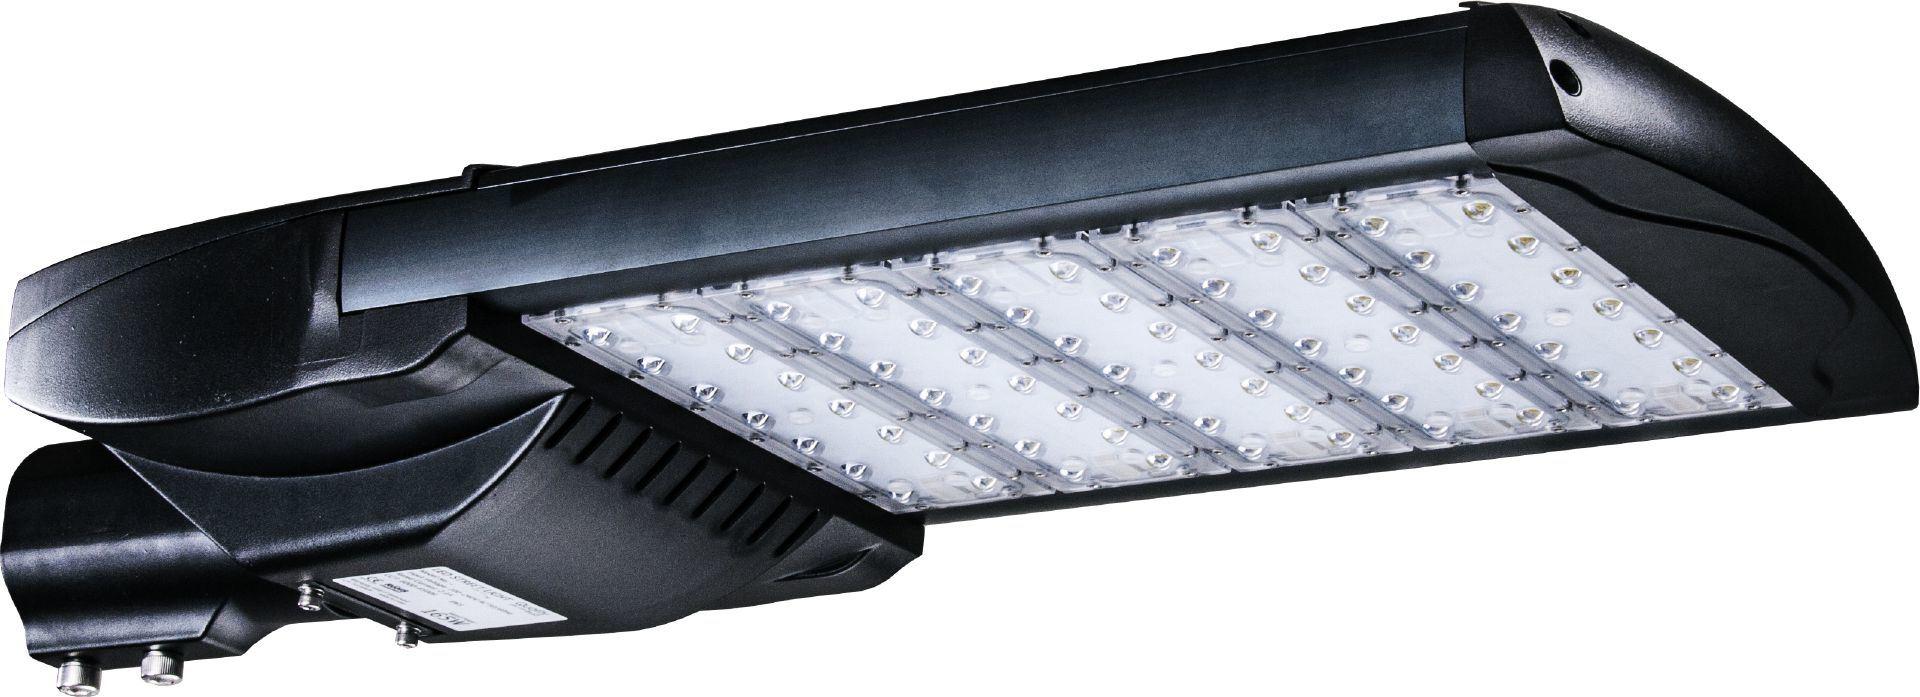 UL Dlc LED Street Cobra Lamp for Area Lighting with Optical Sensor and Surge Protector